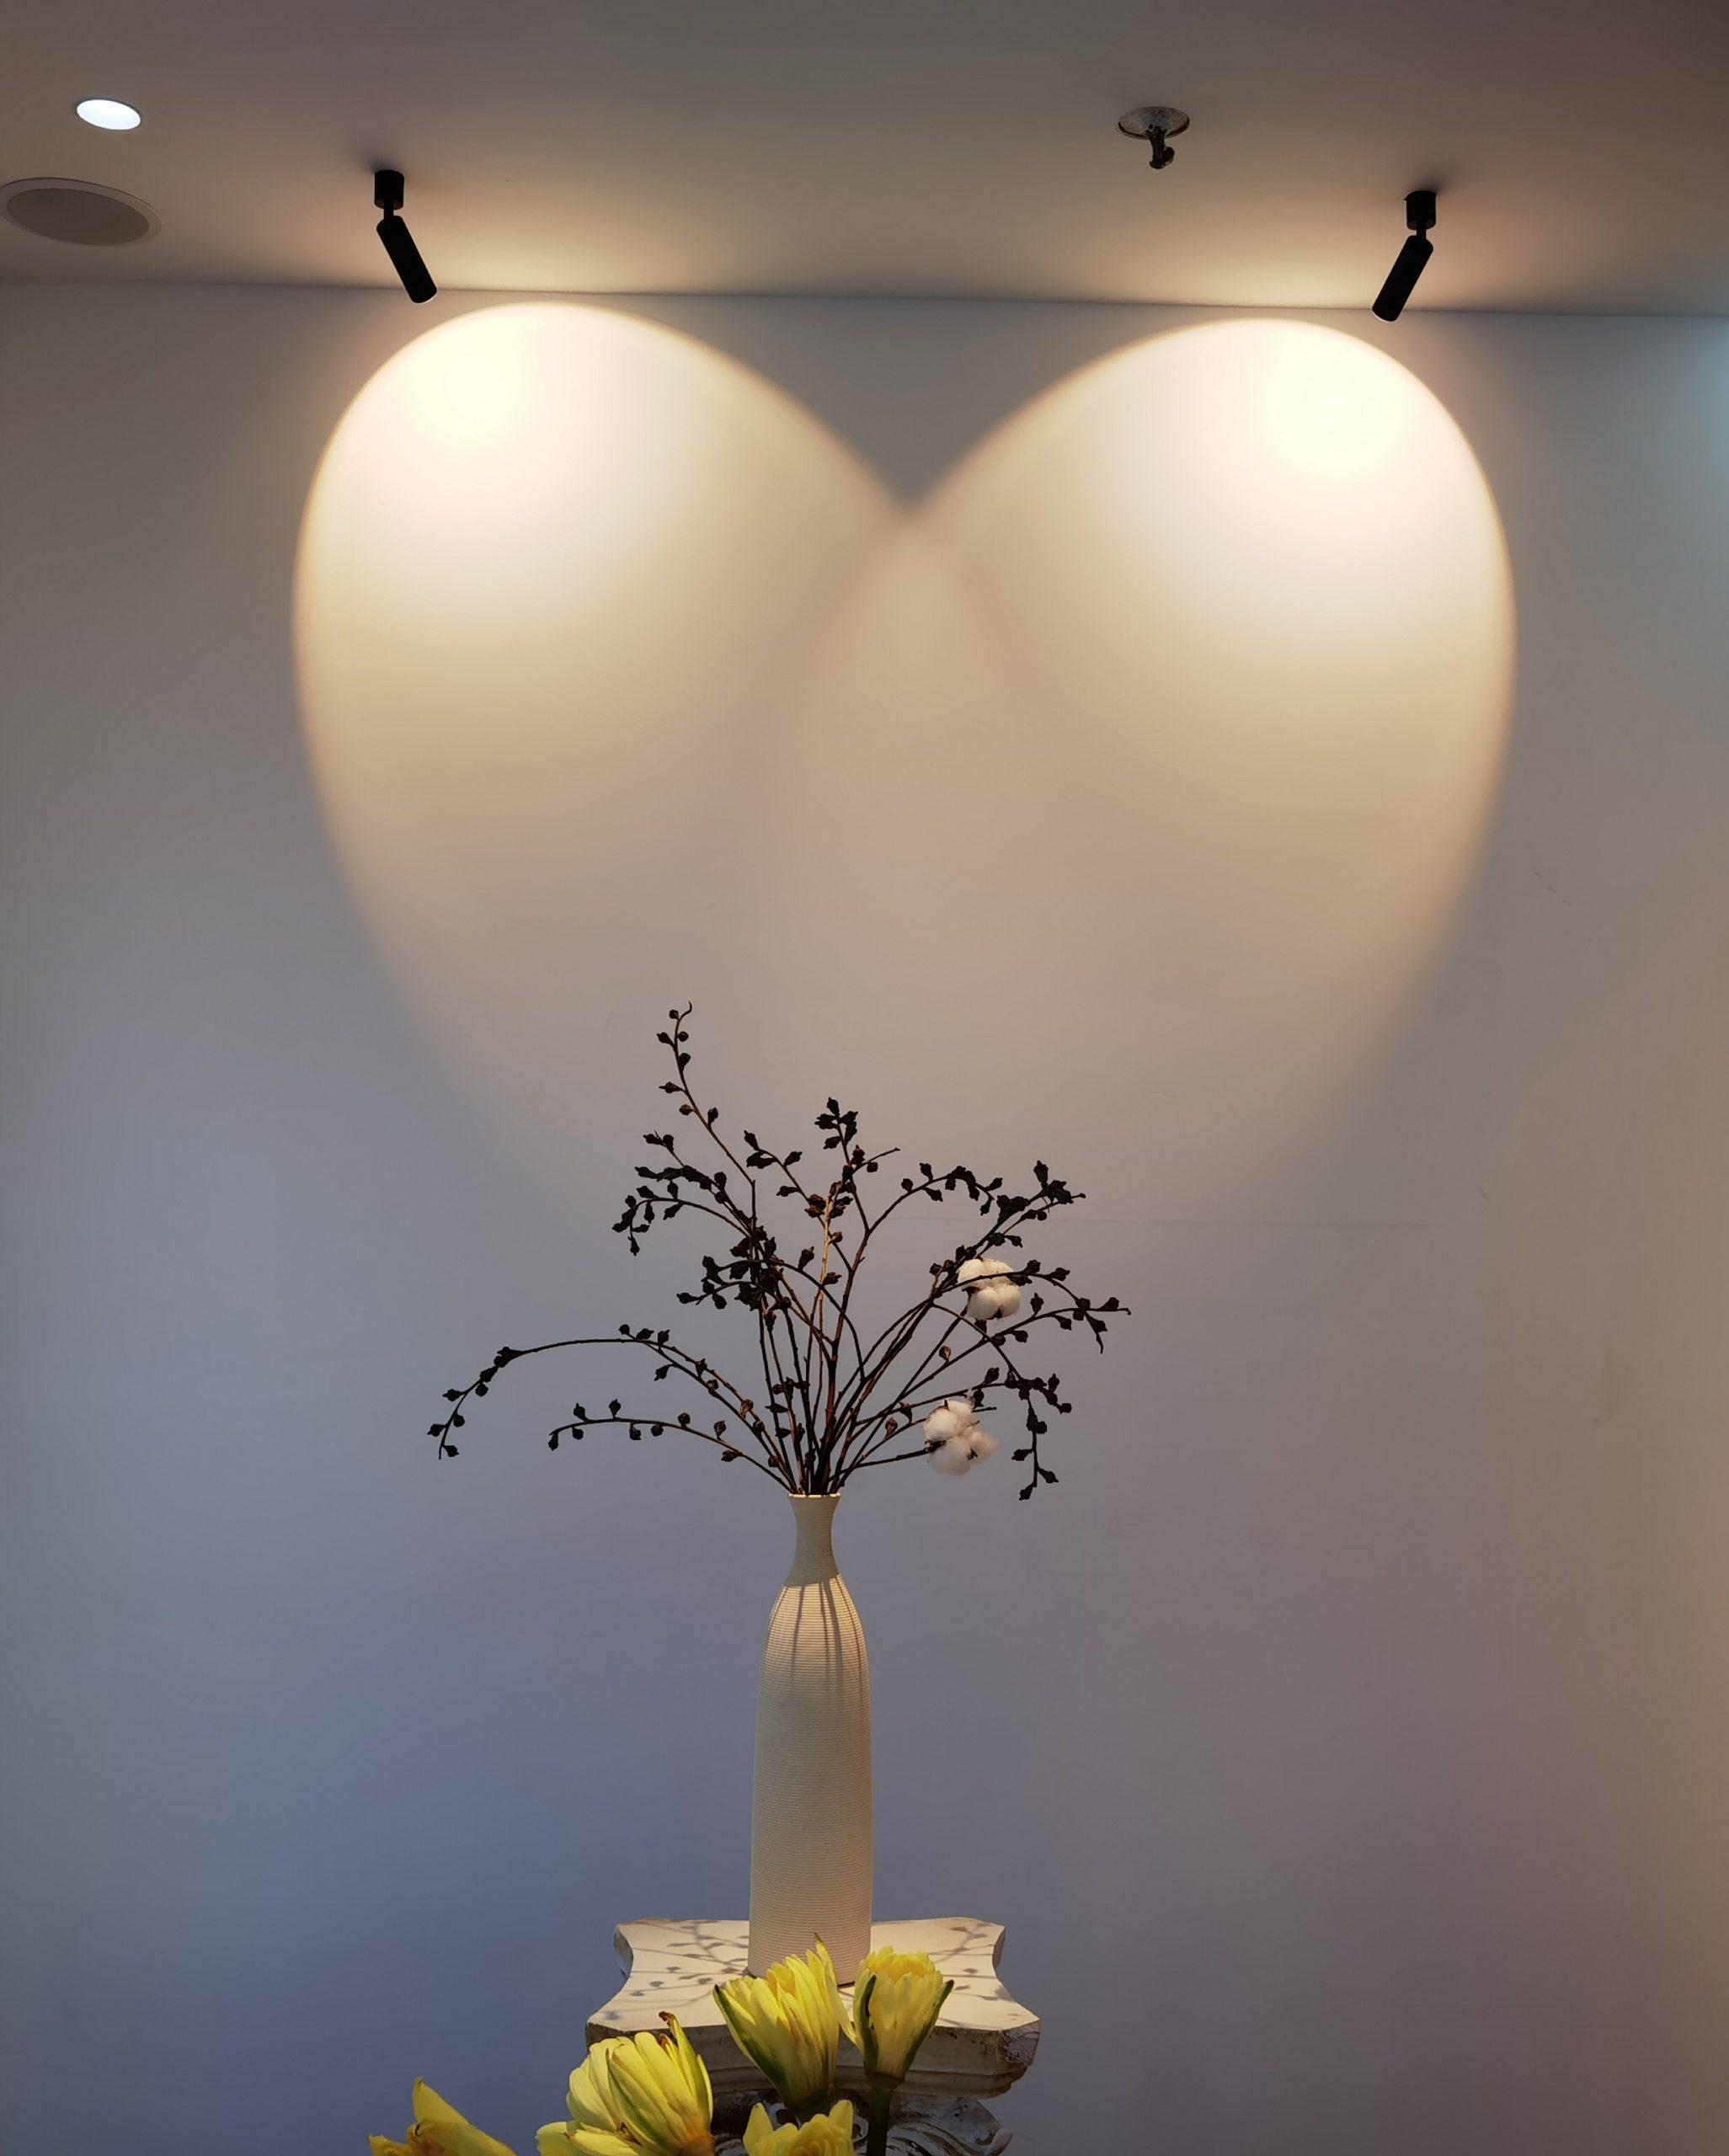 ALPHALIGHTING-2021 Guangzhou International Lighting Exhibition